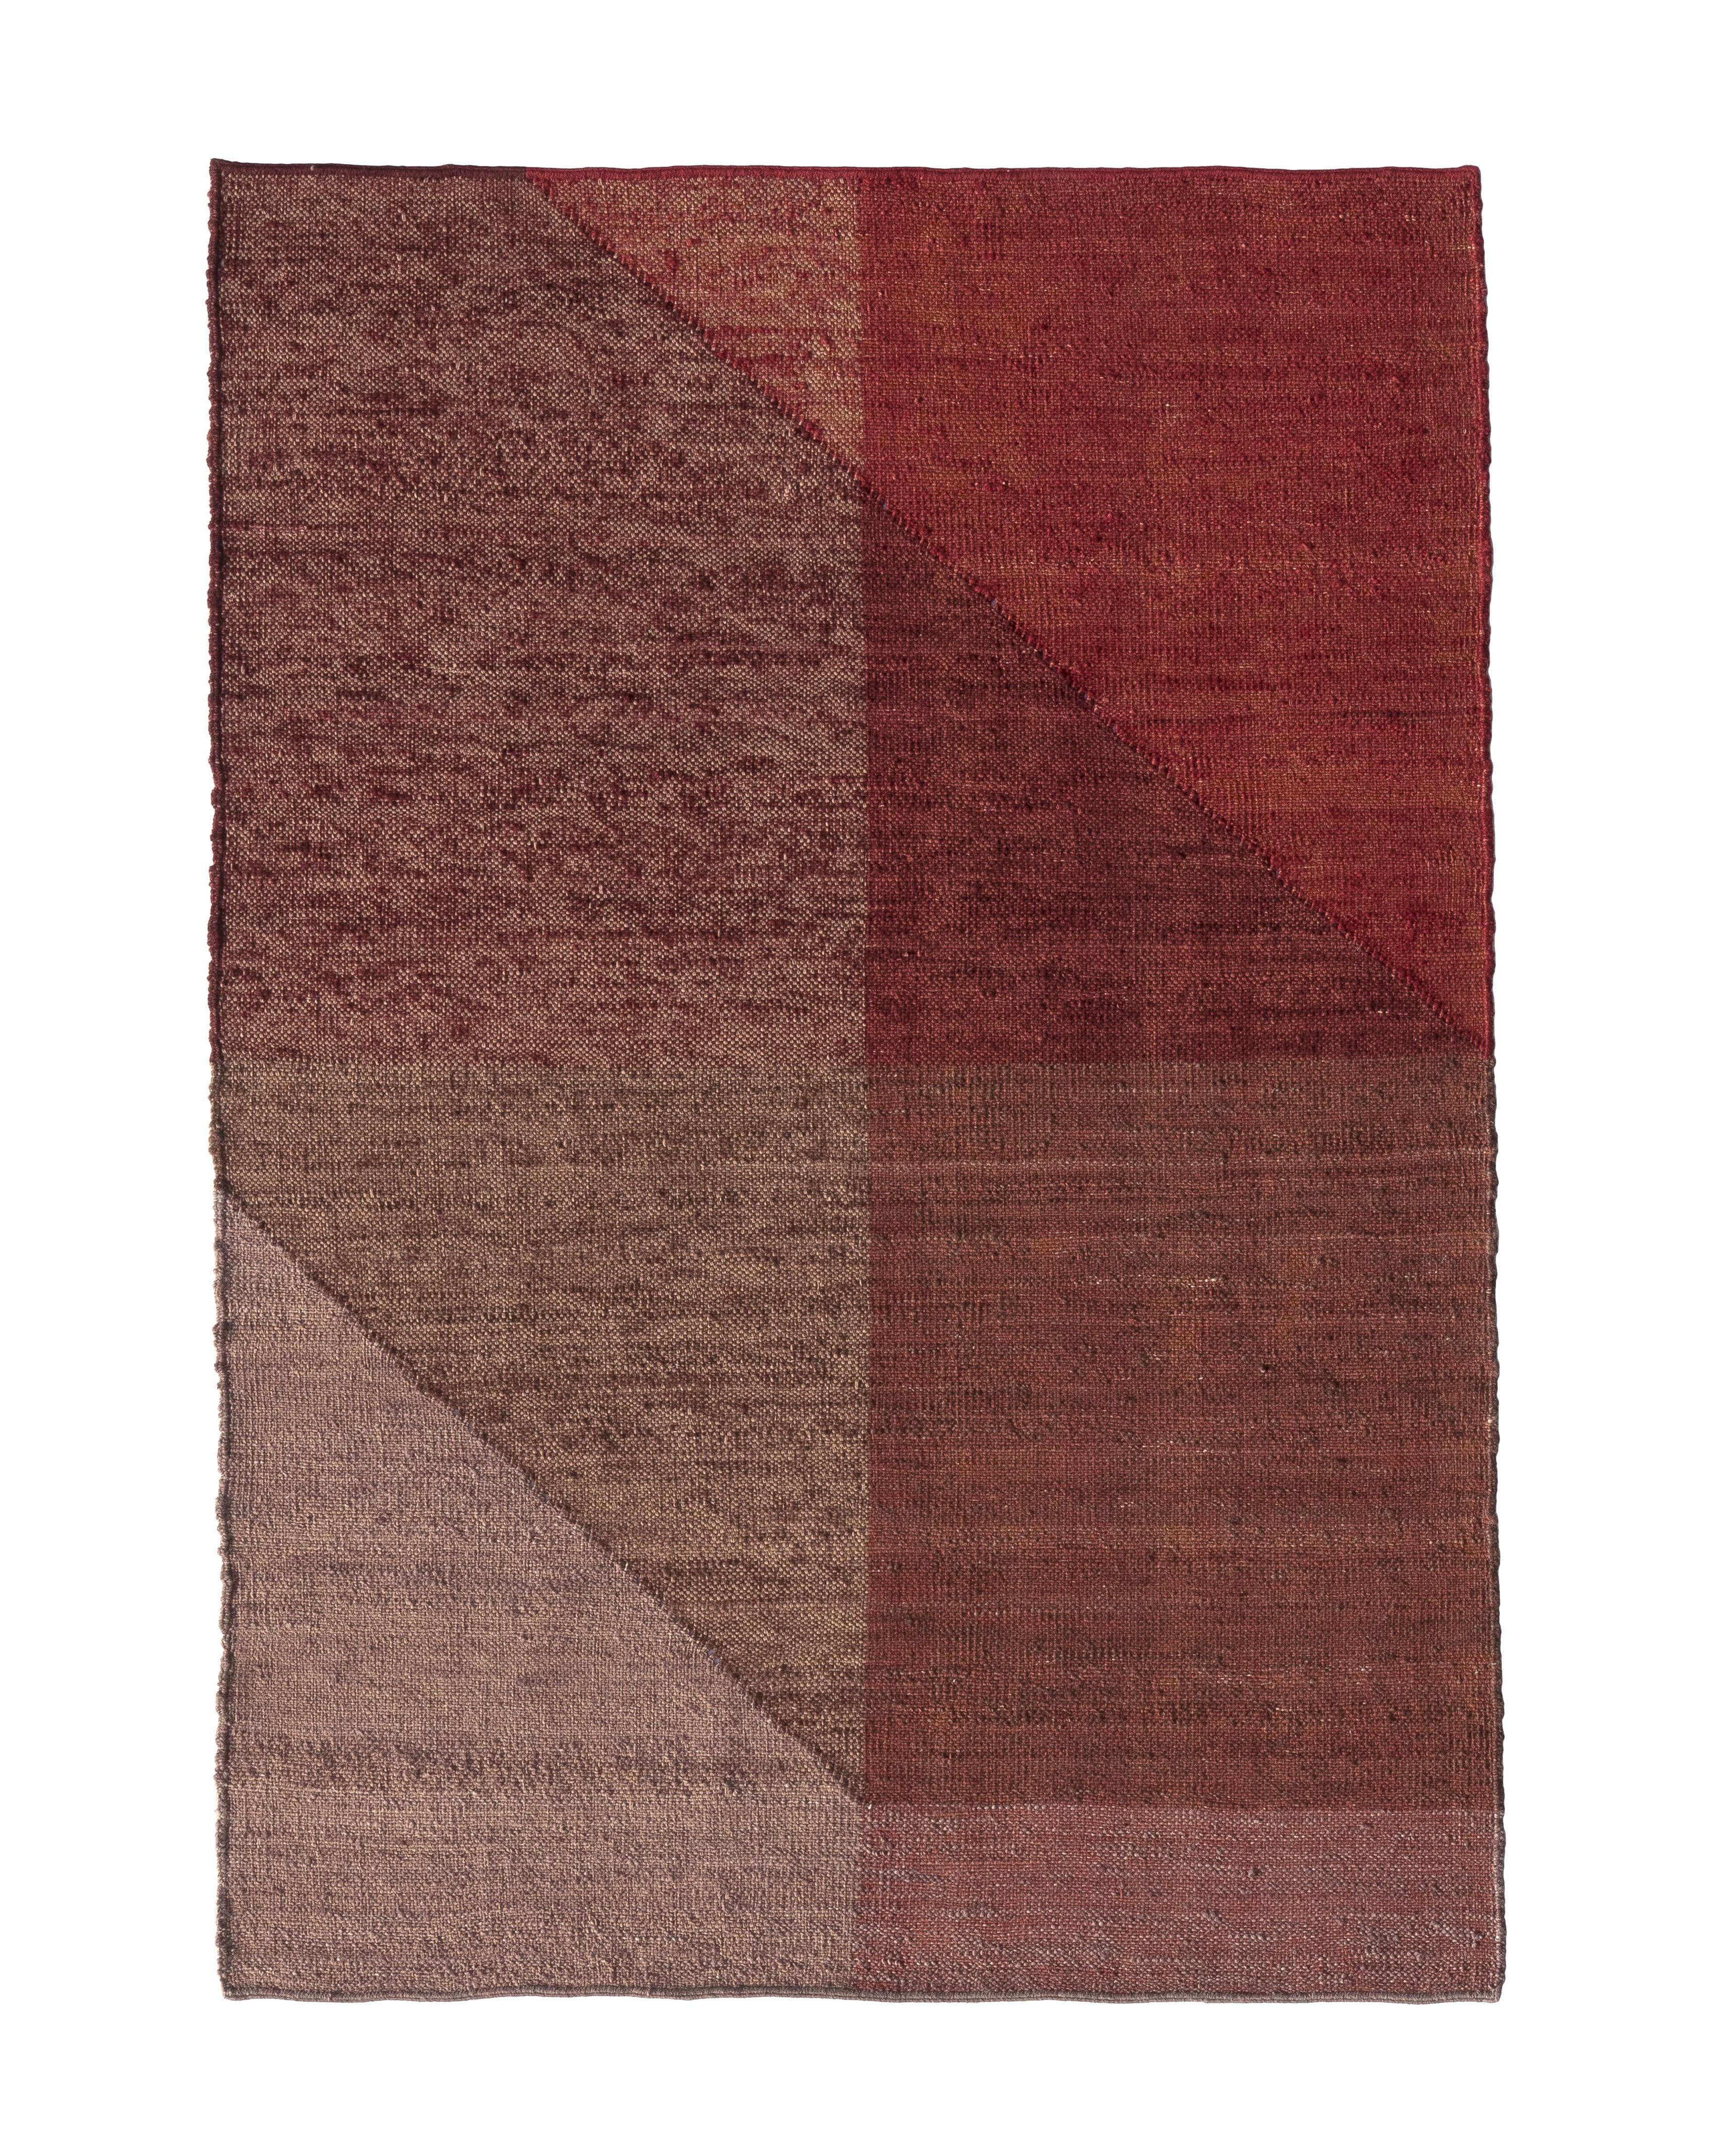 Déco - Tapis - Tapis Capas 1 / 170 x 240 cm - Nanimarquina - Rouge - Laine